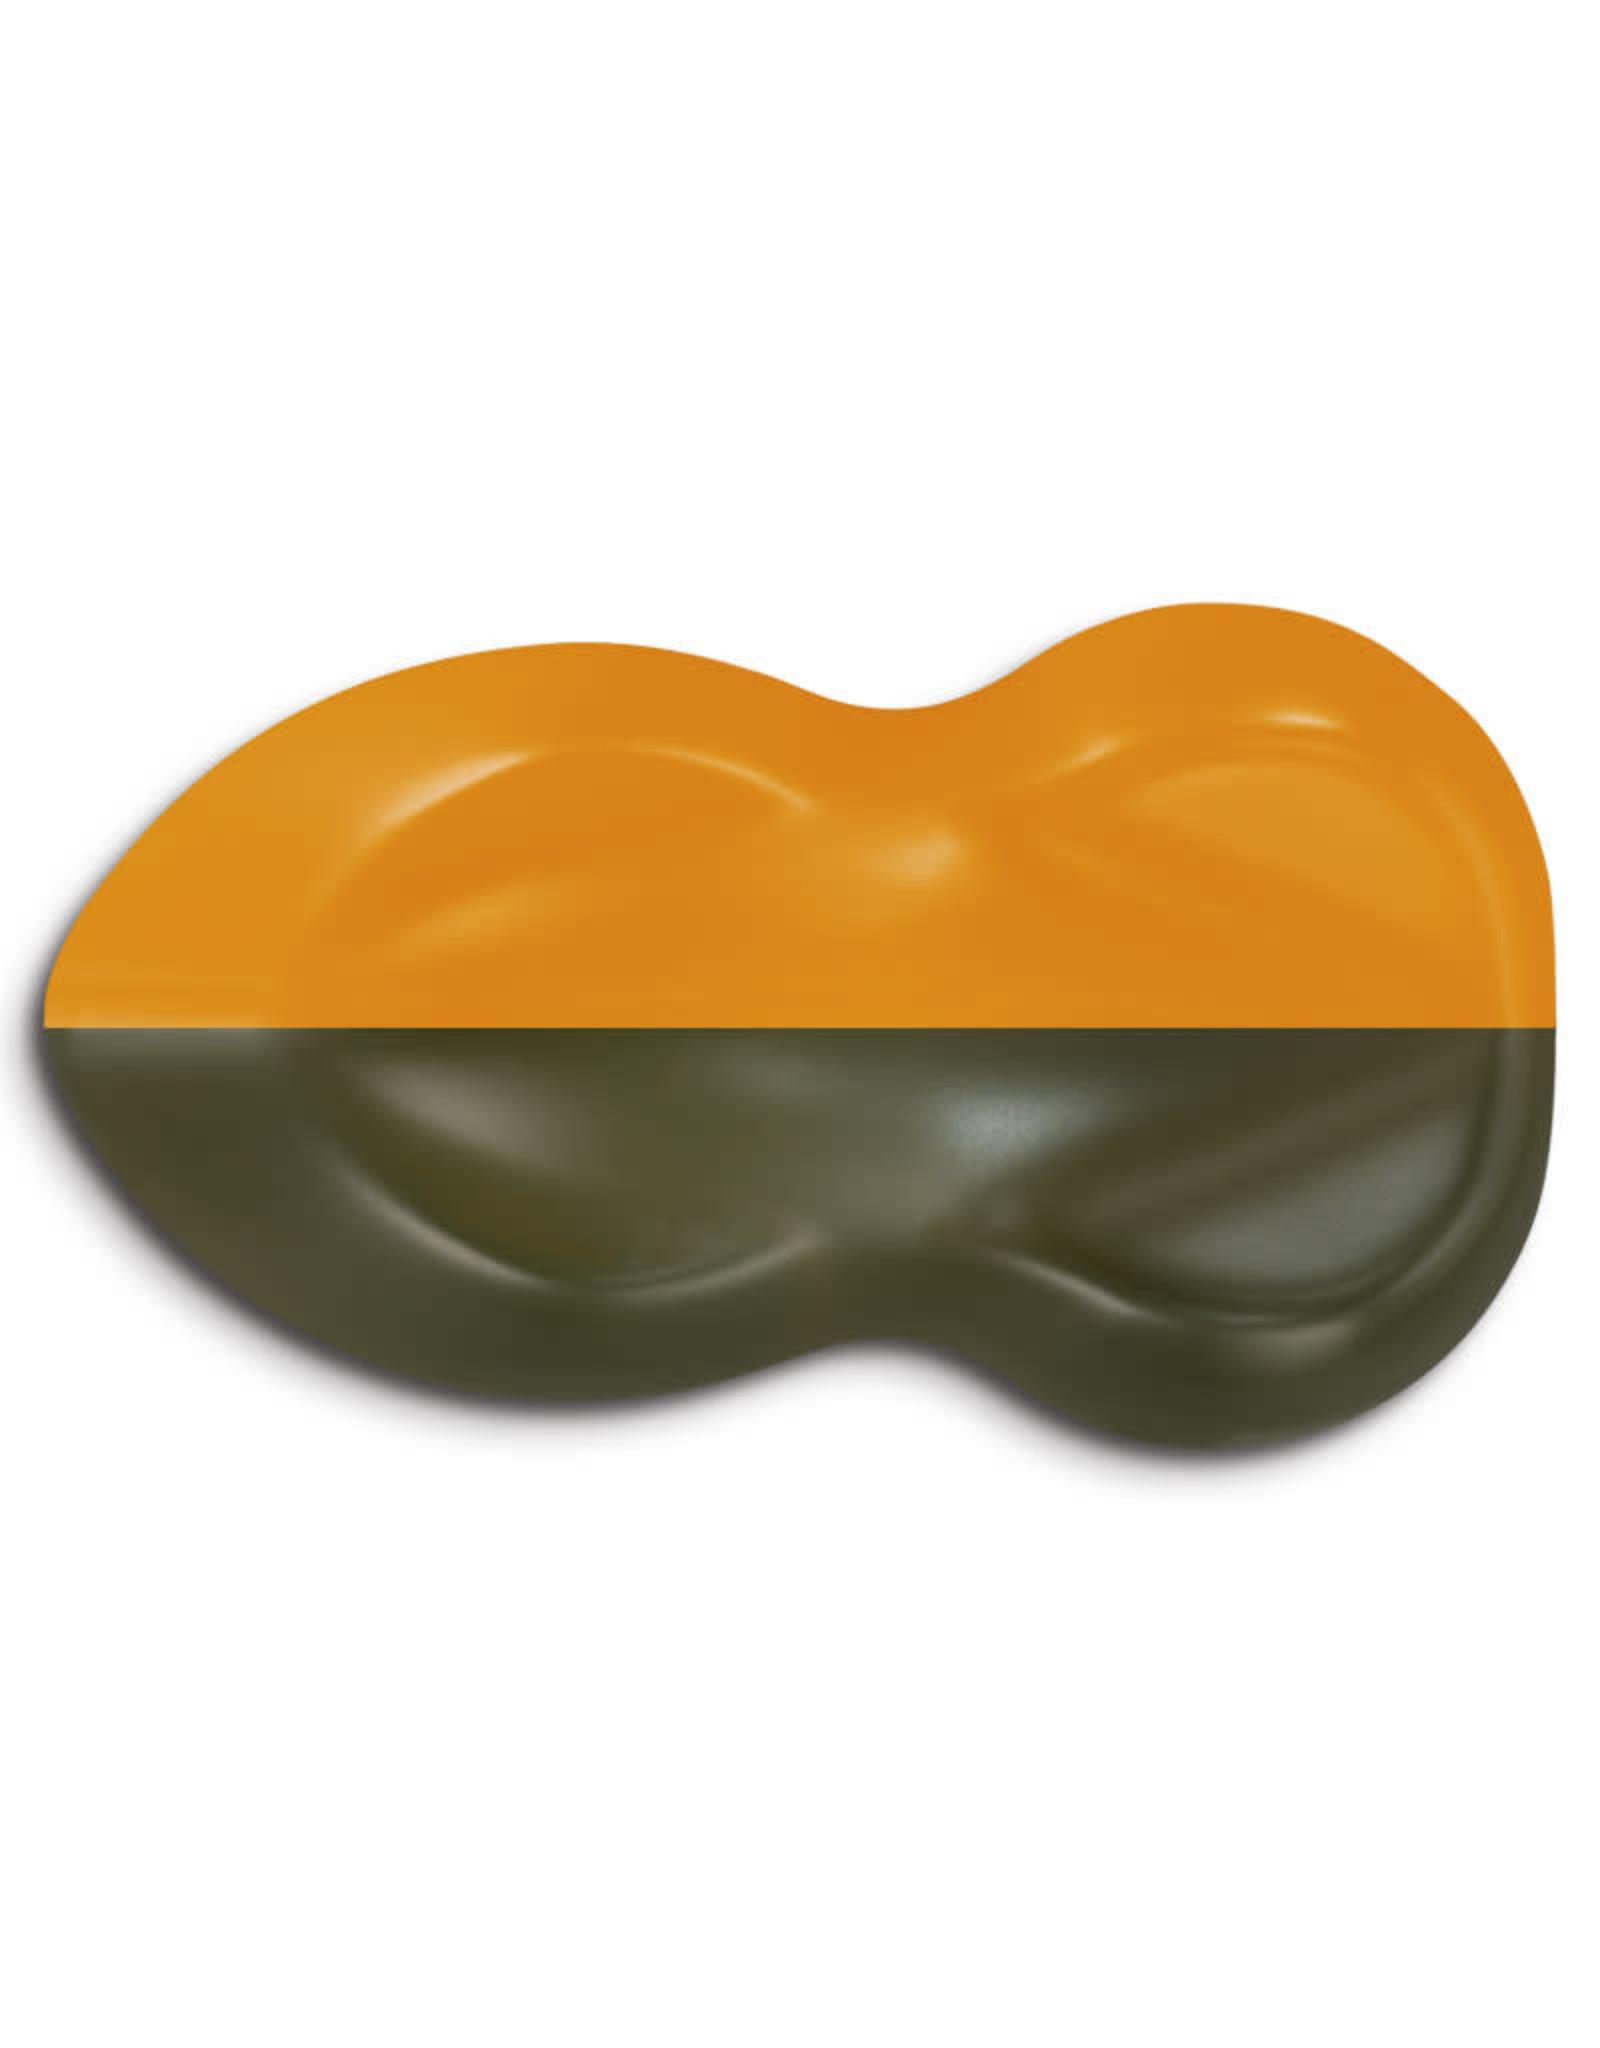 Schmincke Schmincke AERO Color Standard Colours - 28204 Cadmium Orange Hue 28 ml